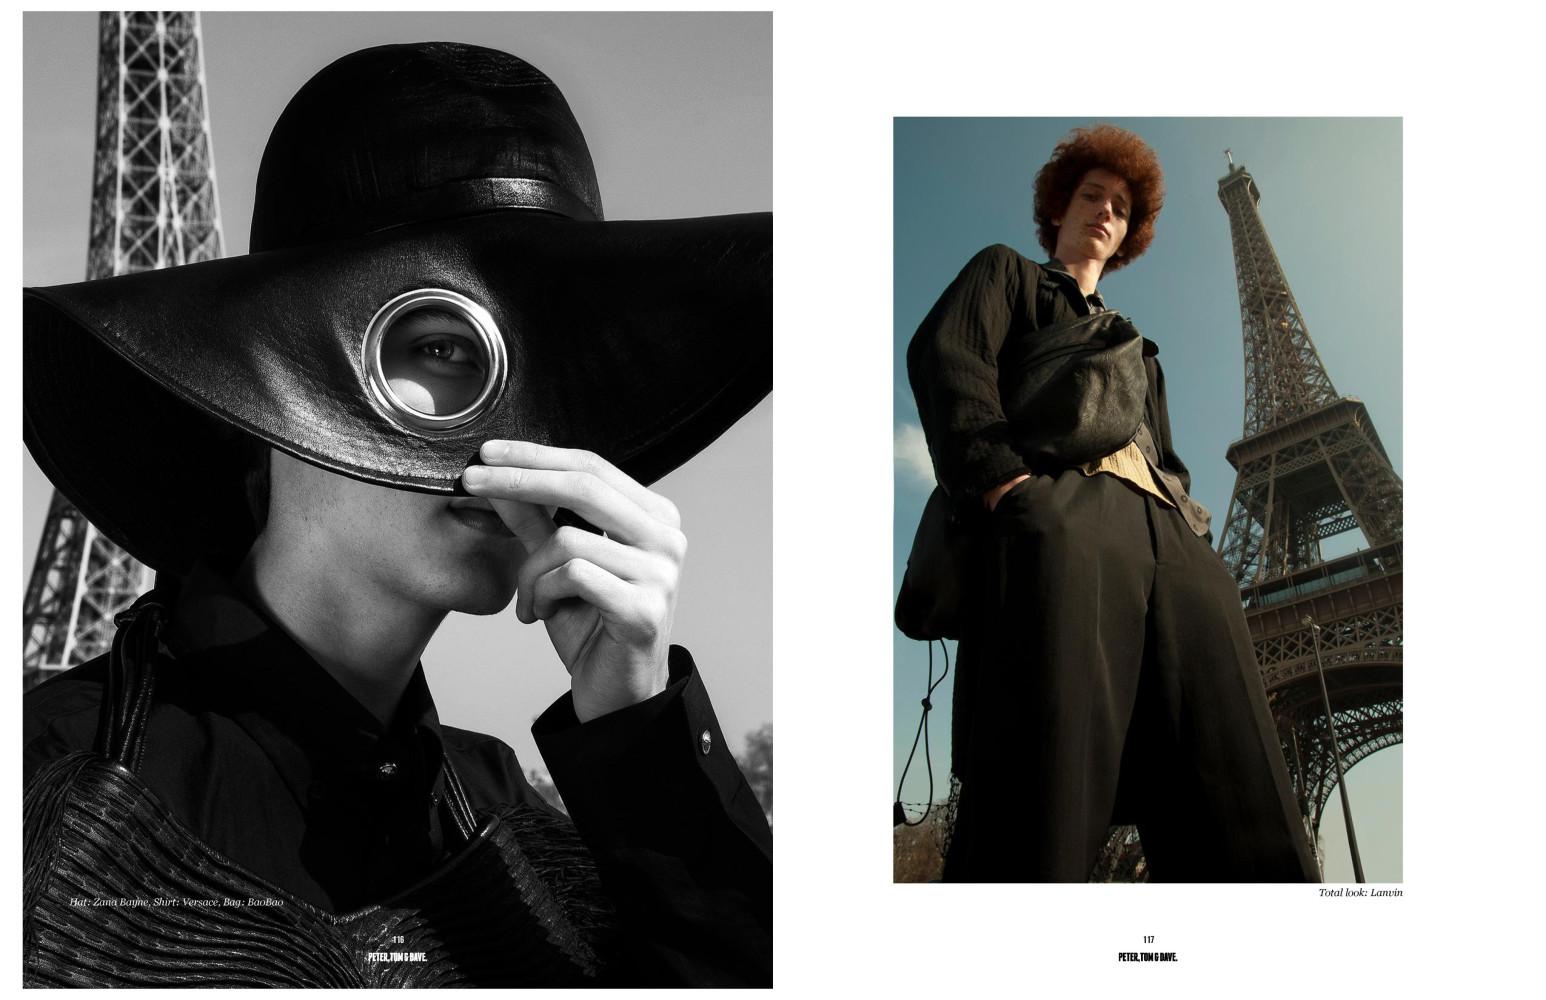 Luca Vicino and Jean-Michel Alvarez for Peter, Tom & Dave Magazine